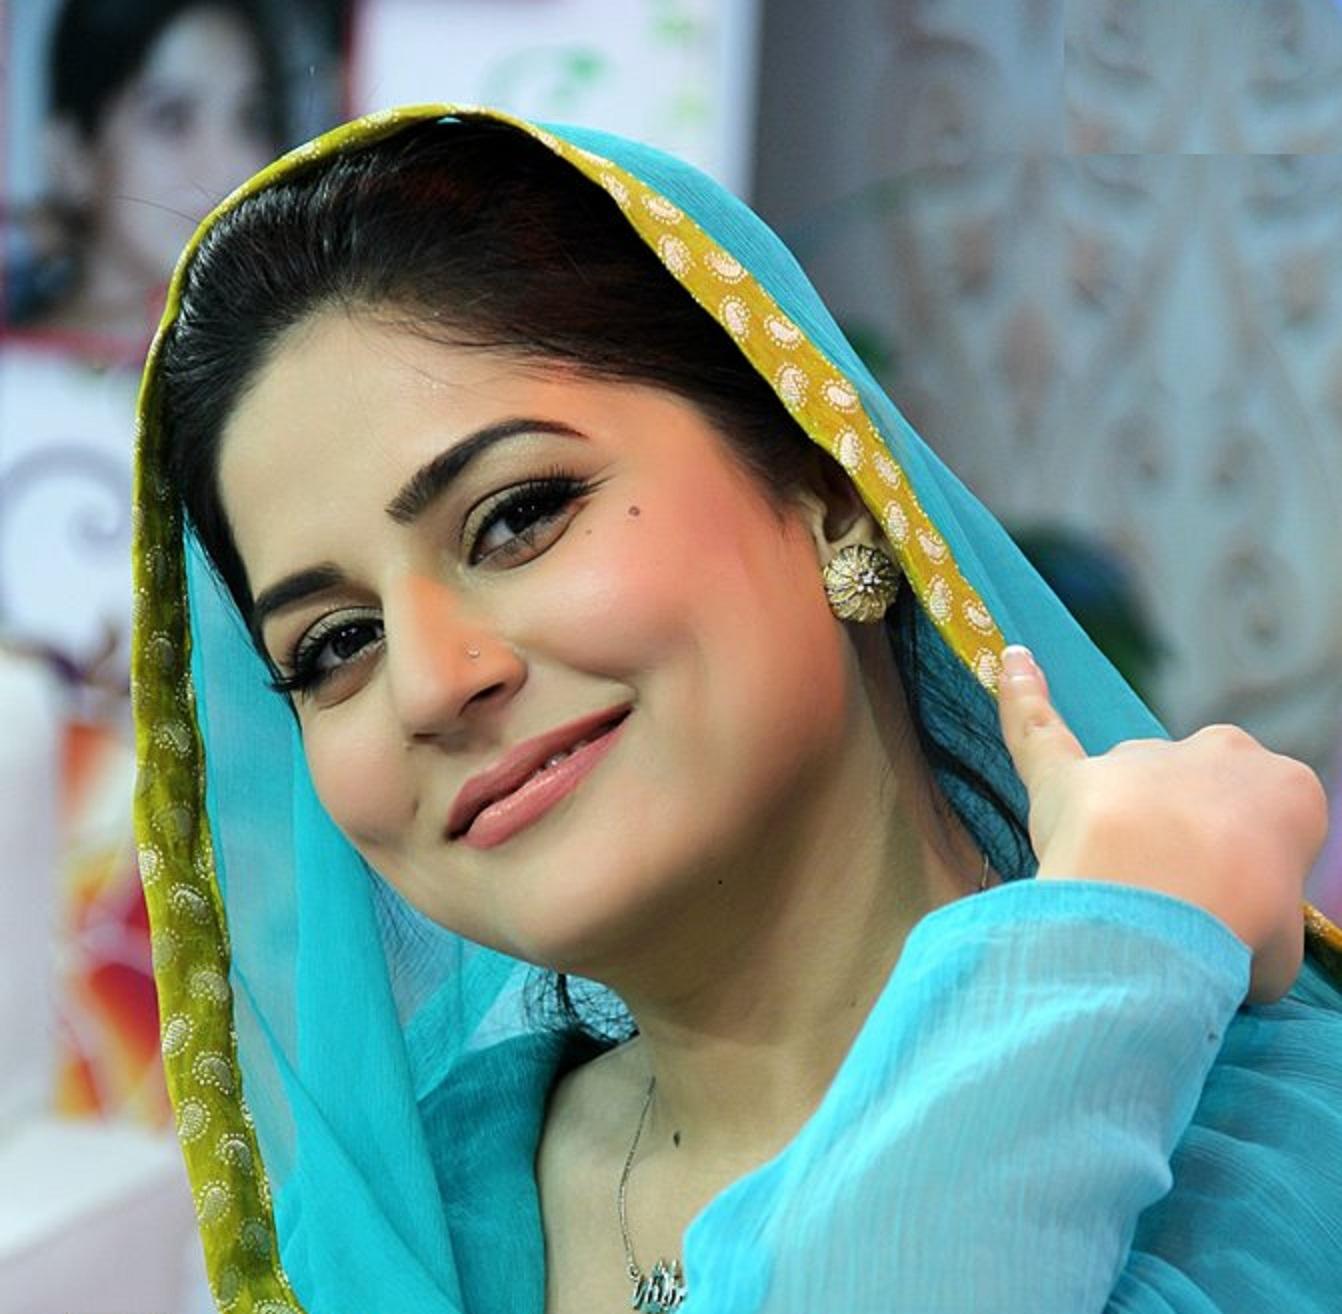 Cute Baby Girl Photos Wallpapers Sanam Baloch Images Hd Wallpaper All 4u Wallpaper